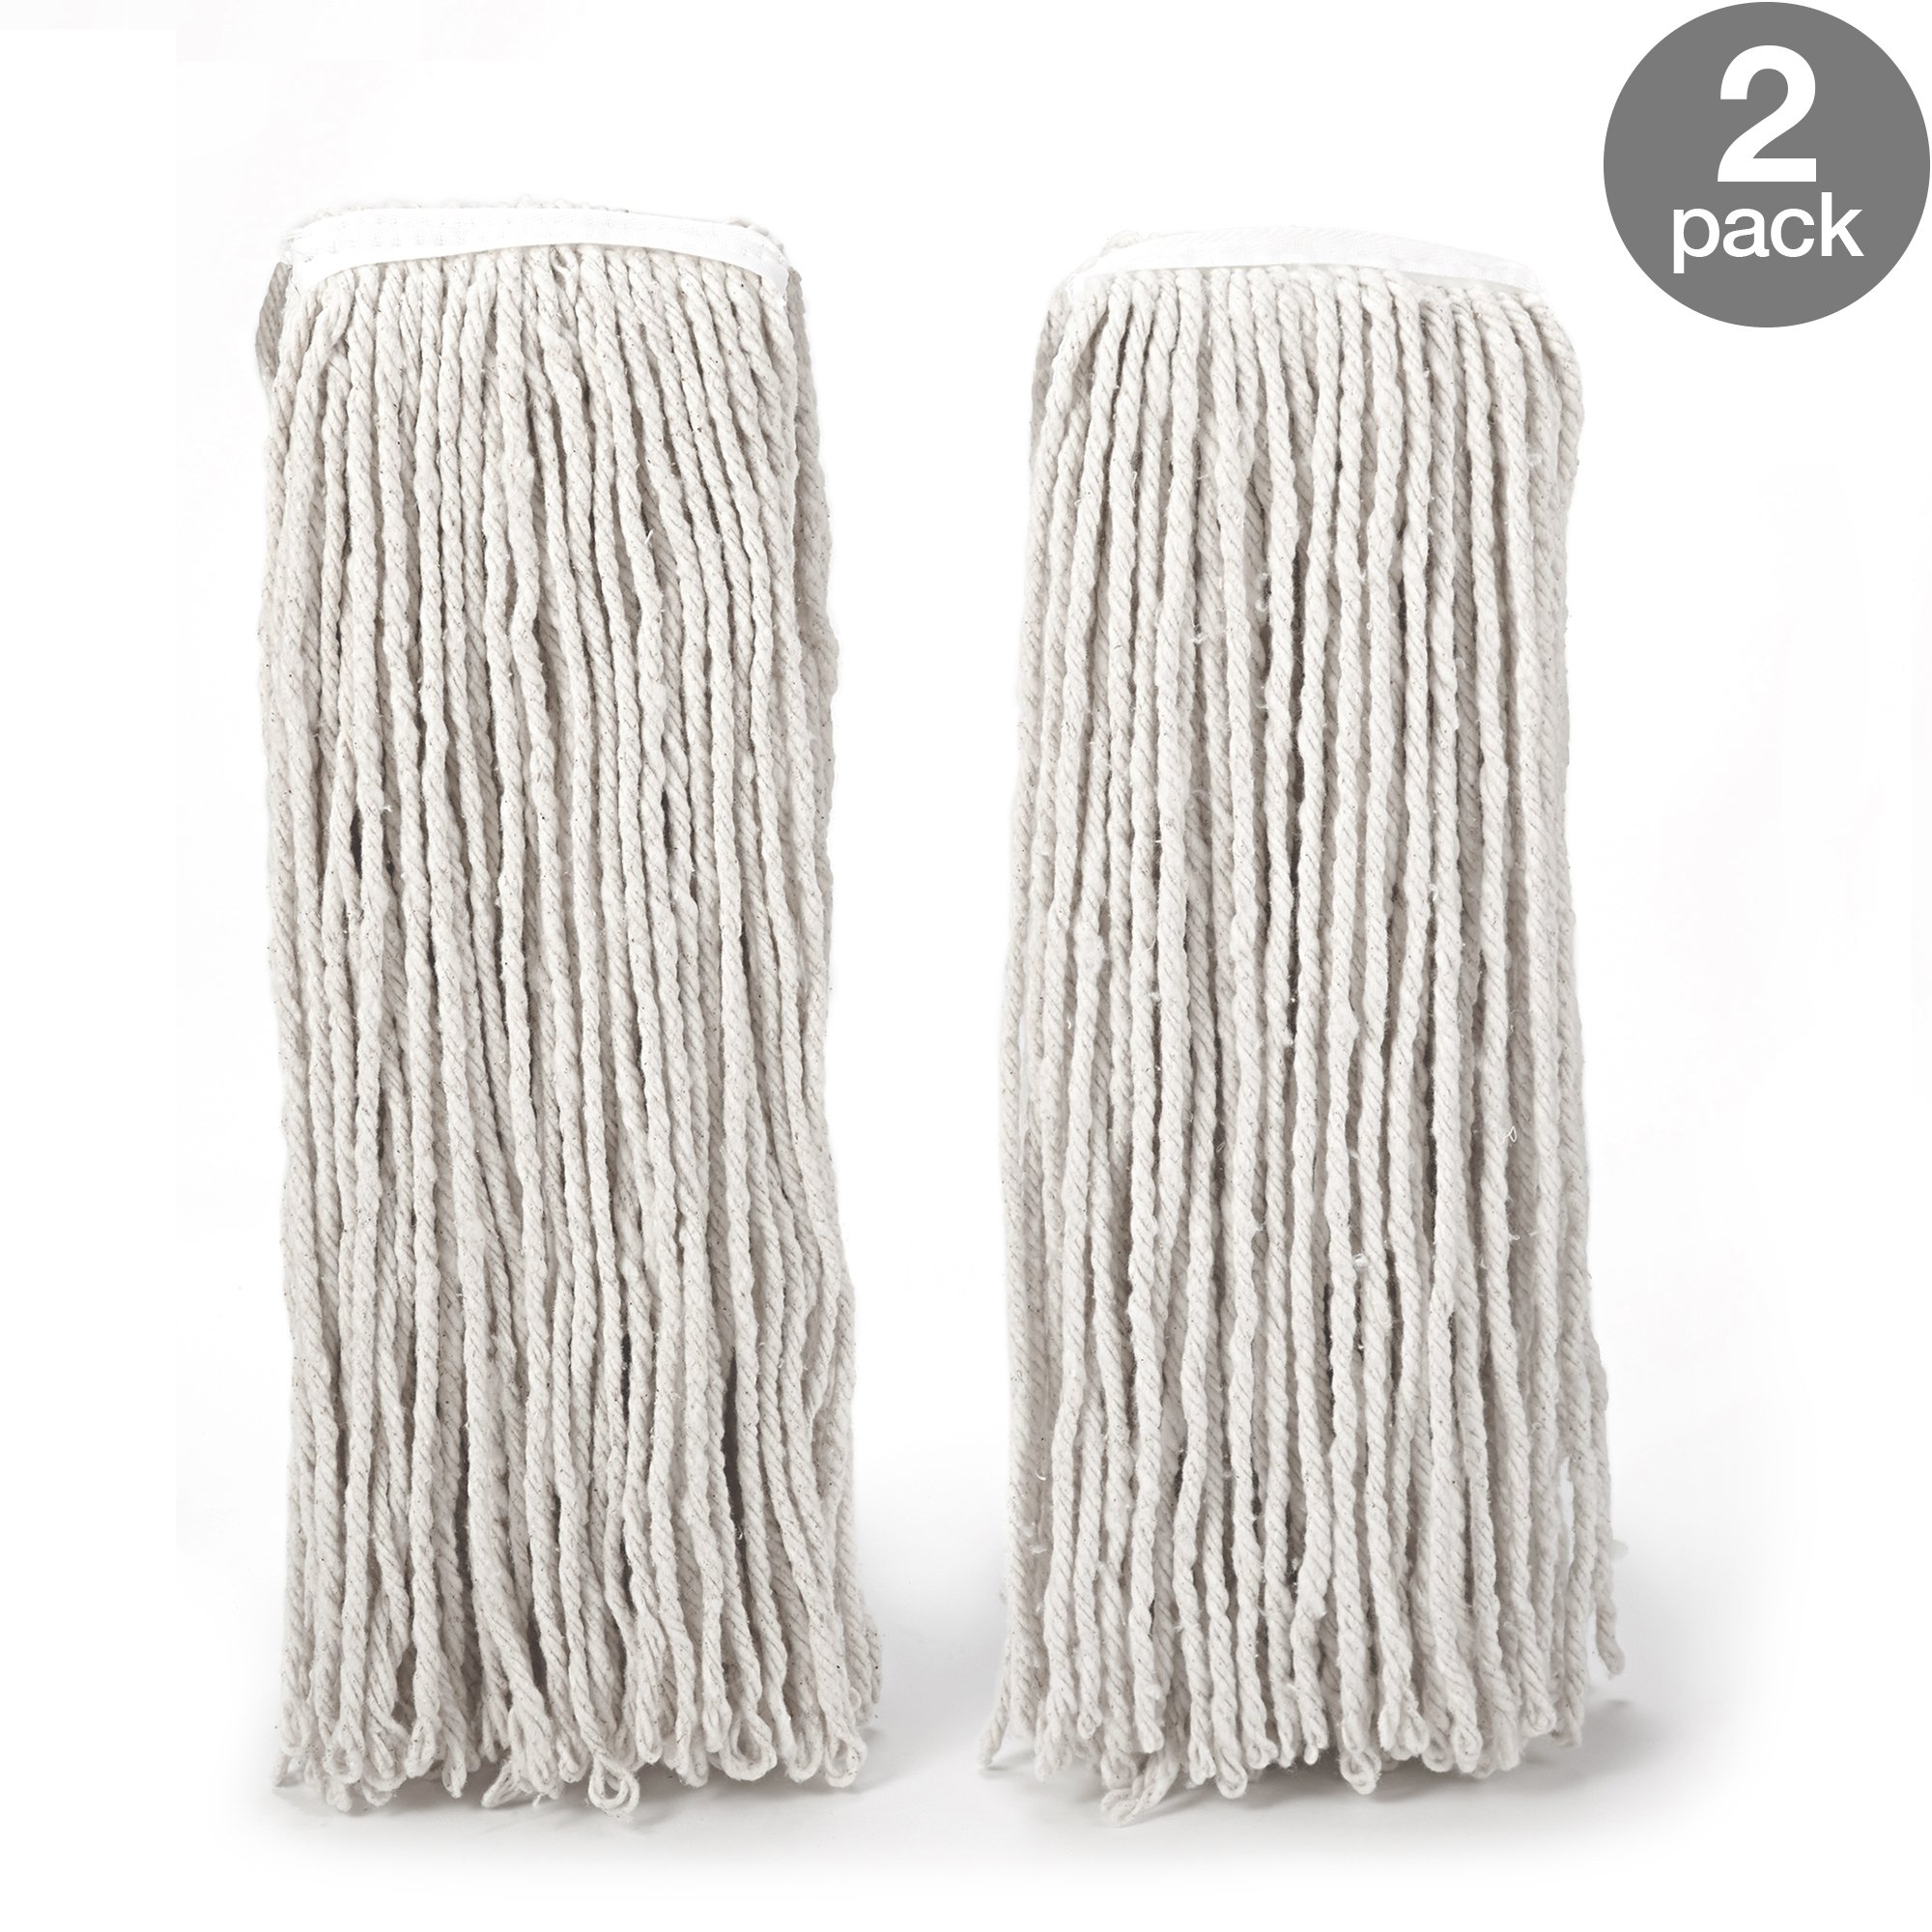 O-Cedar Heavy Duty Looped-End String Mop Refills 2 Pack